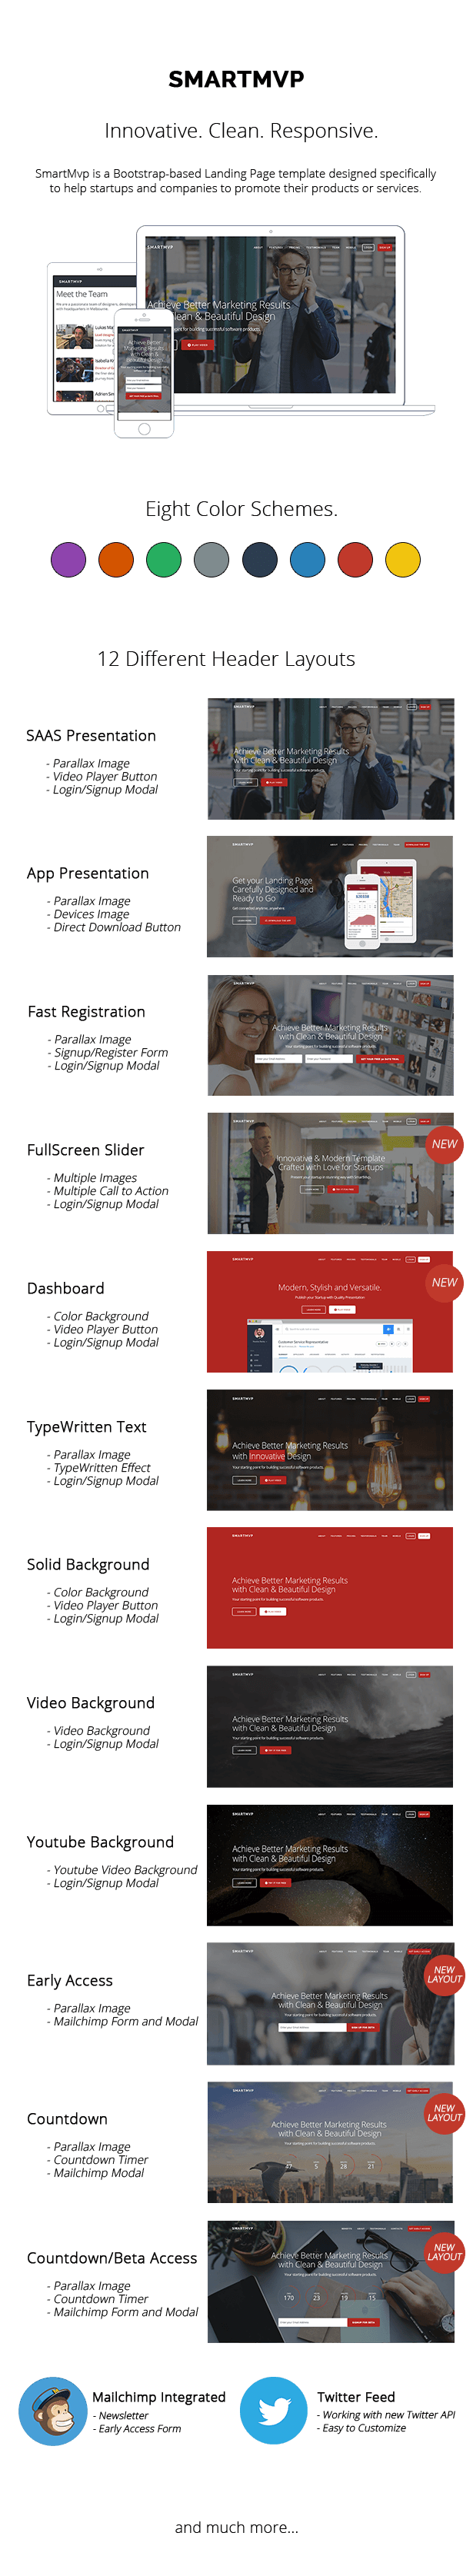 SmartMvp - Startup Landing Page Template - 1